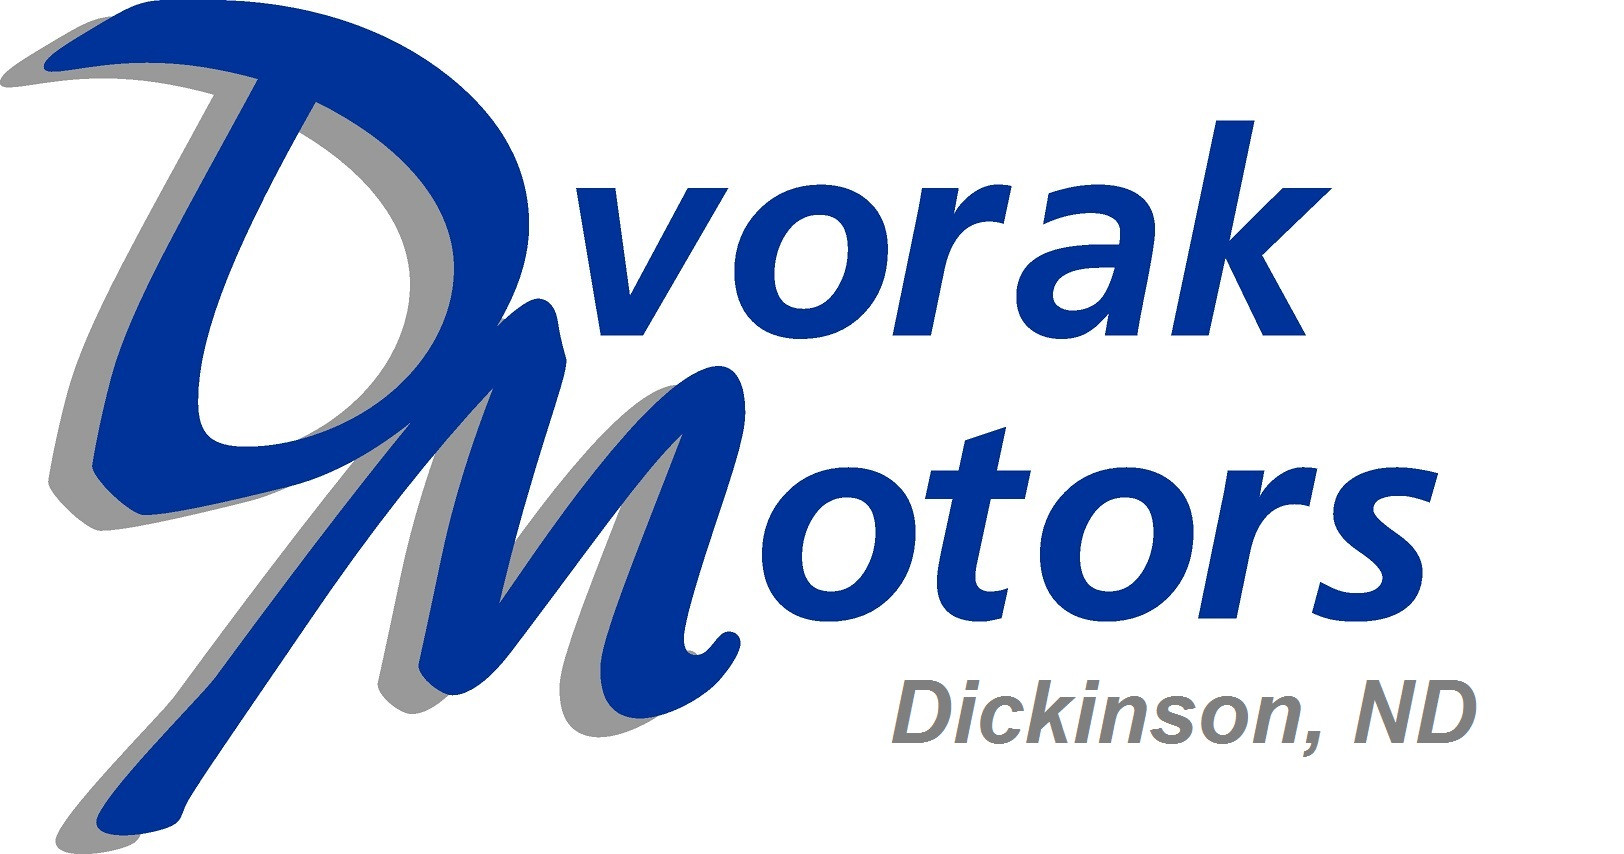 dvorak motors dickinson logo.jpg